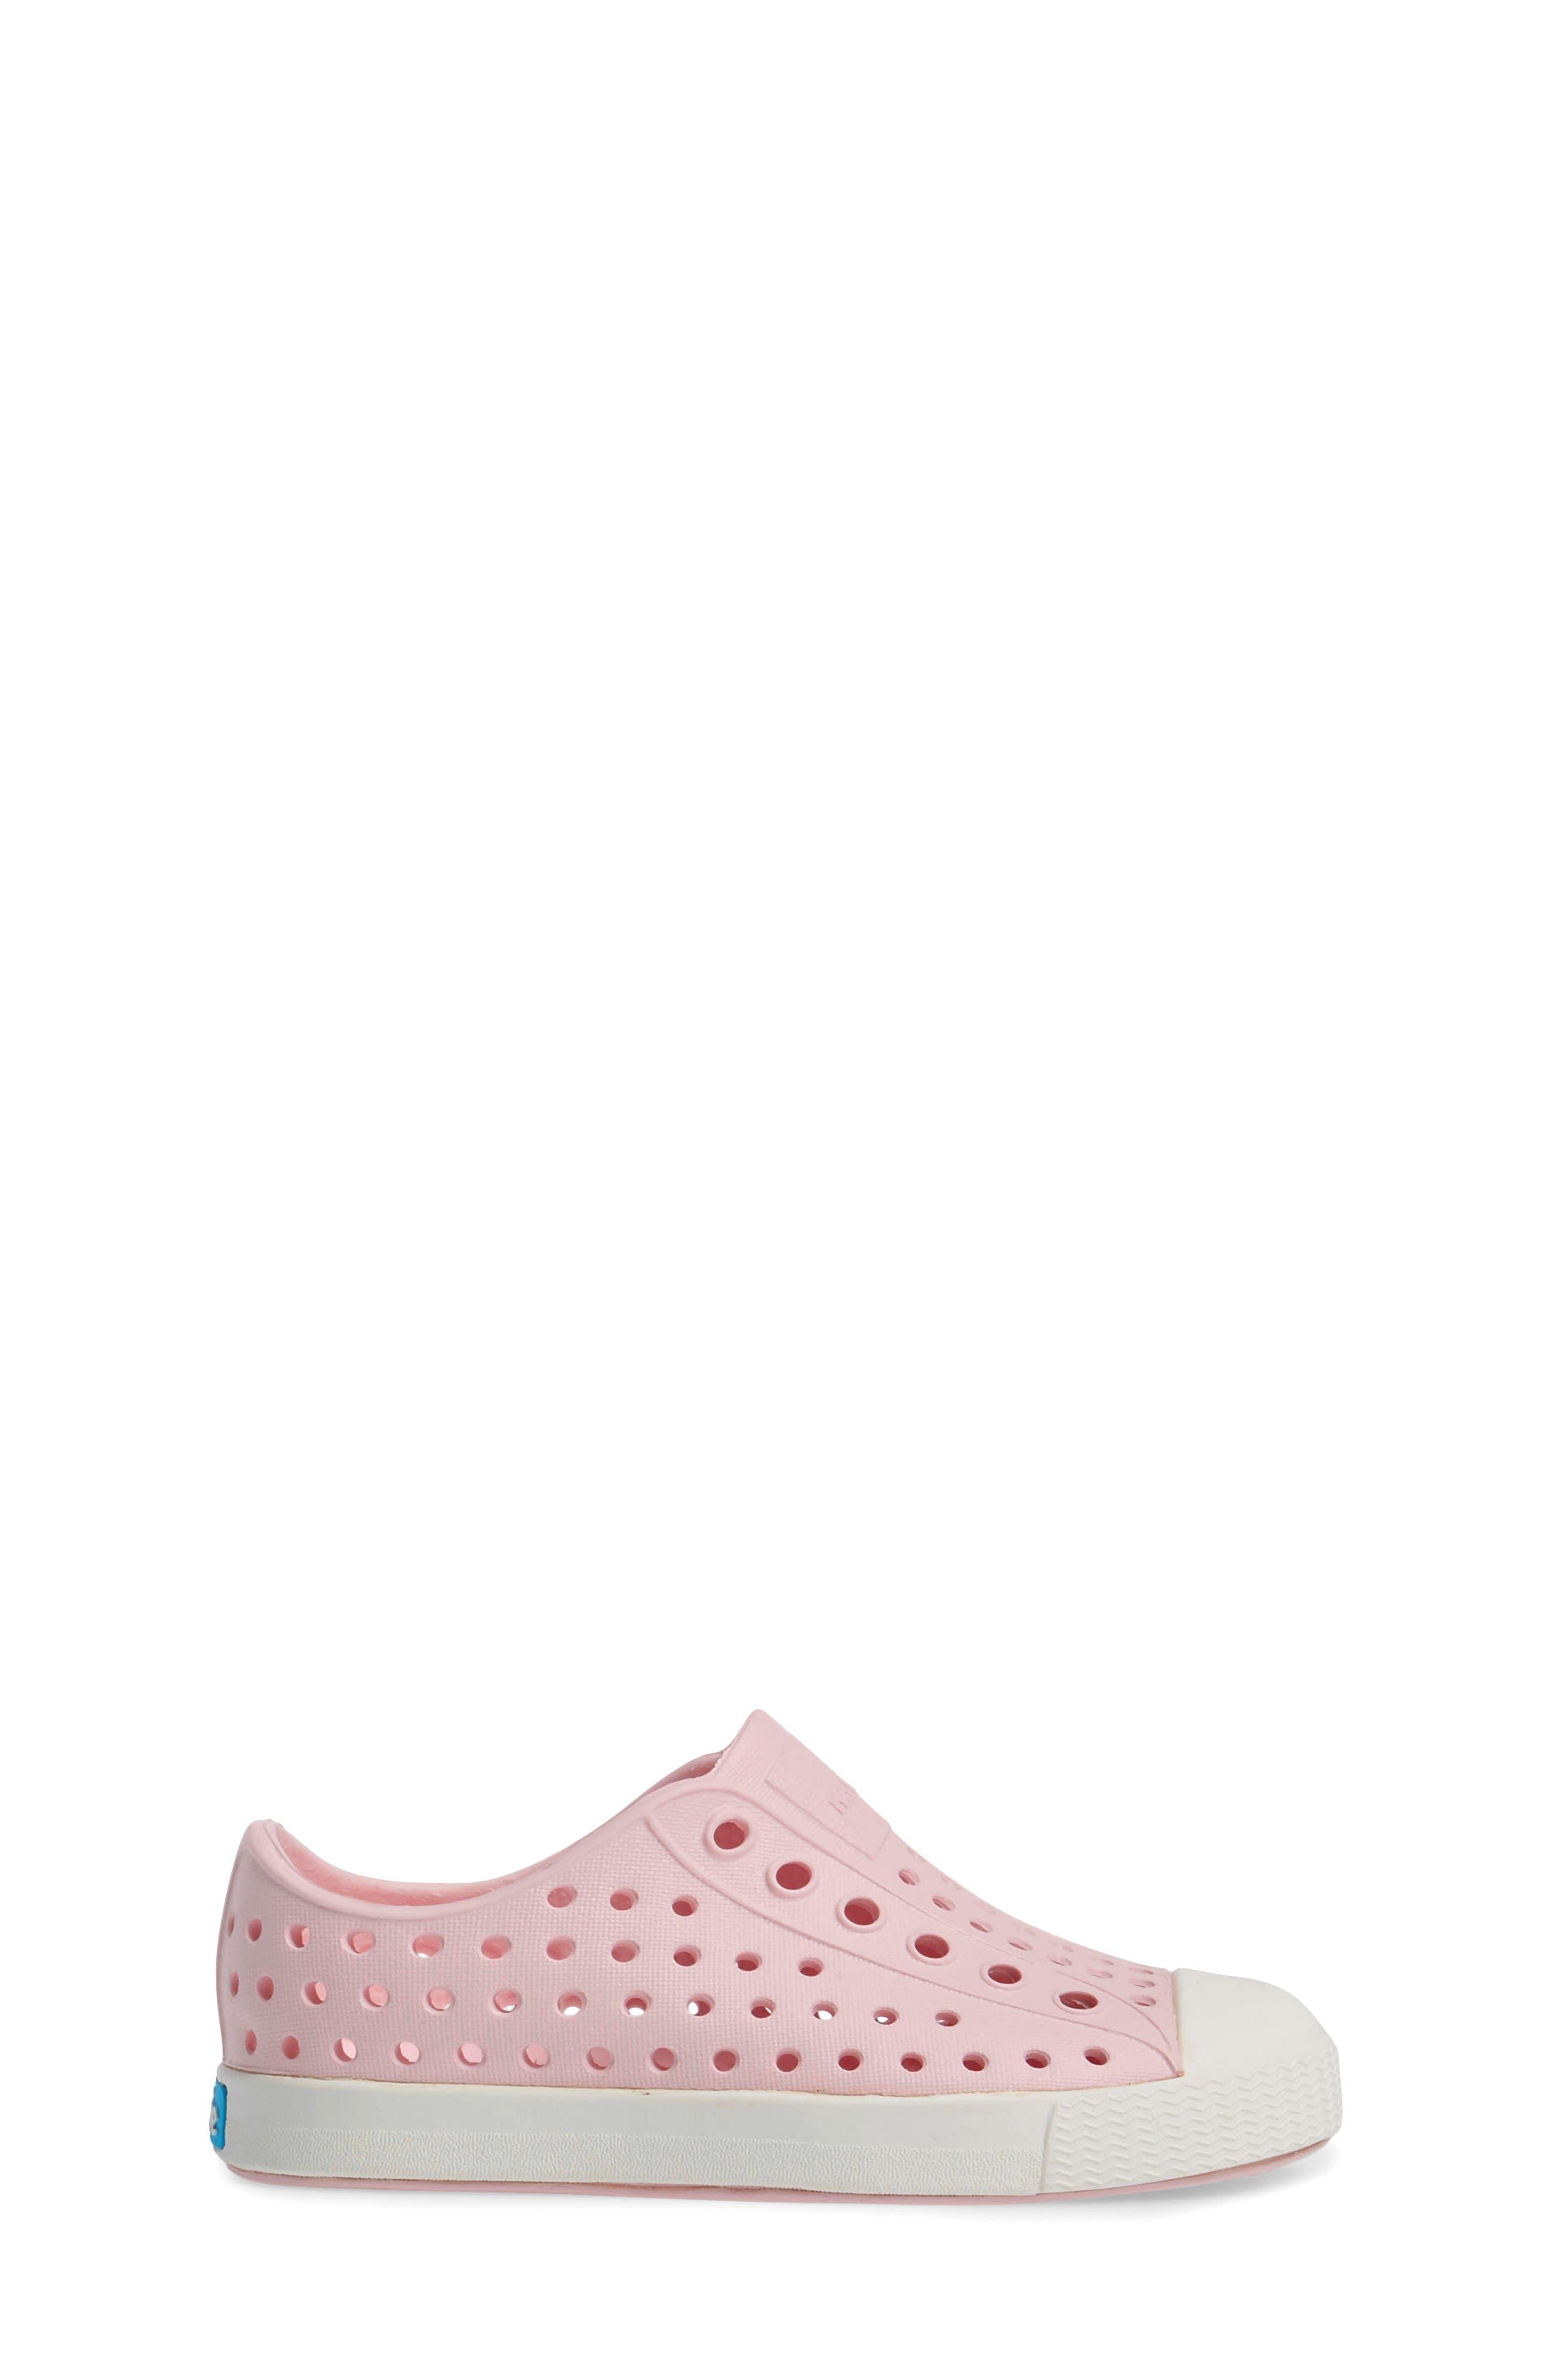 'Jefferson' Water Friendly Slip-On Sneaker,                             Alternate thumbnail 166, color,